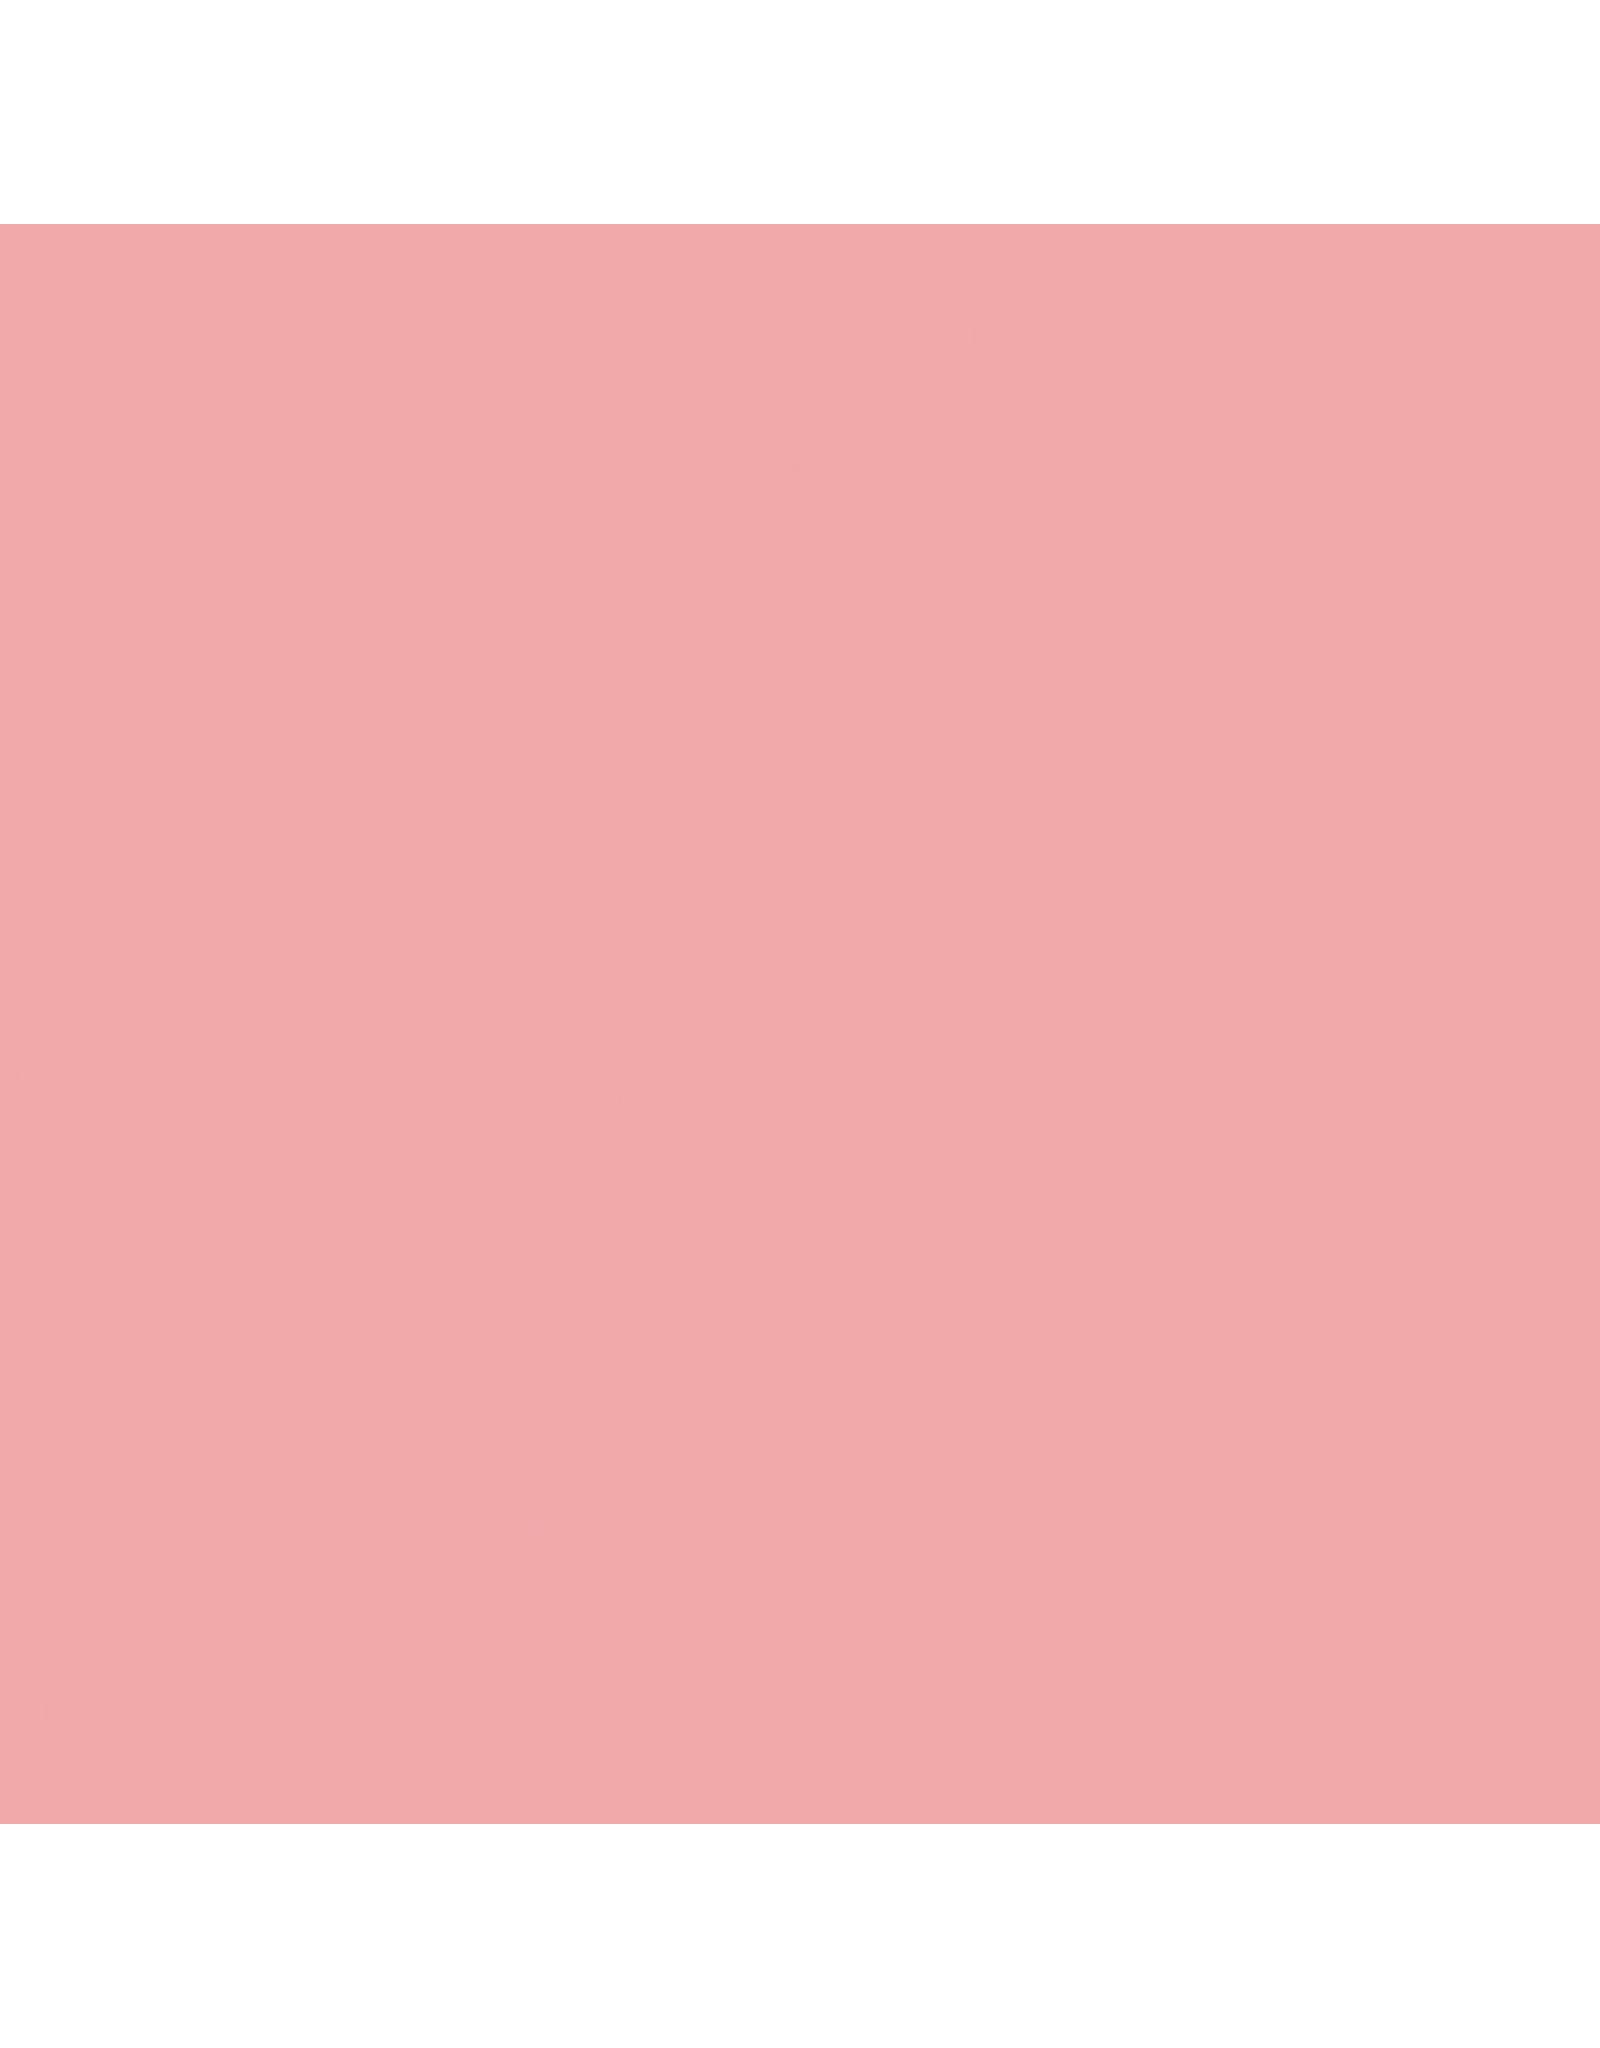 Northcott Colorworks - Rose Petal